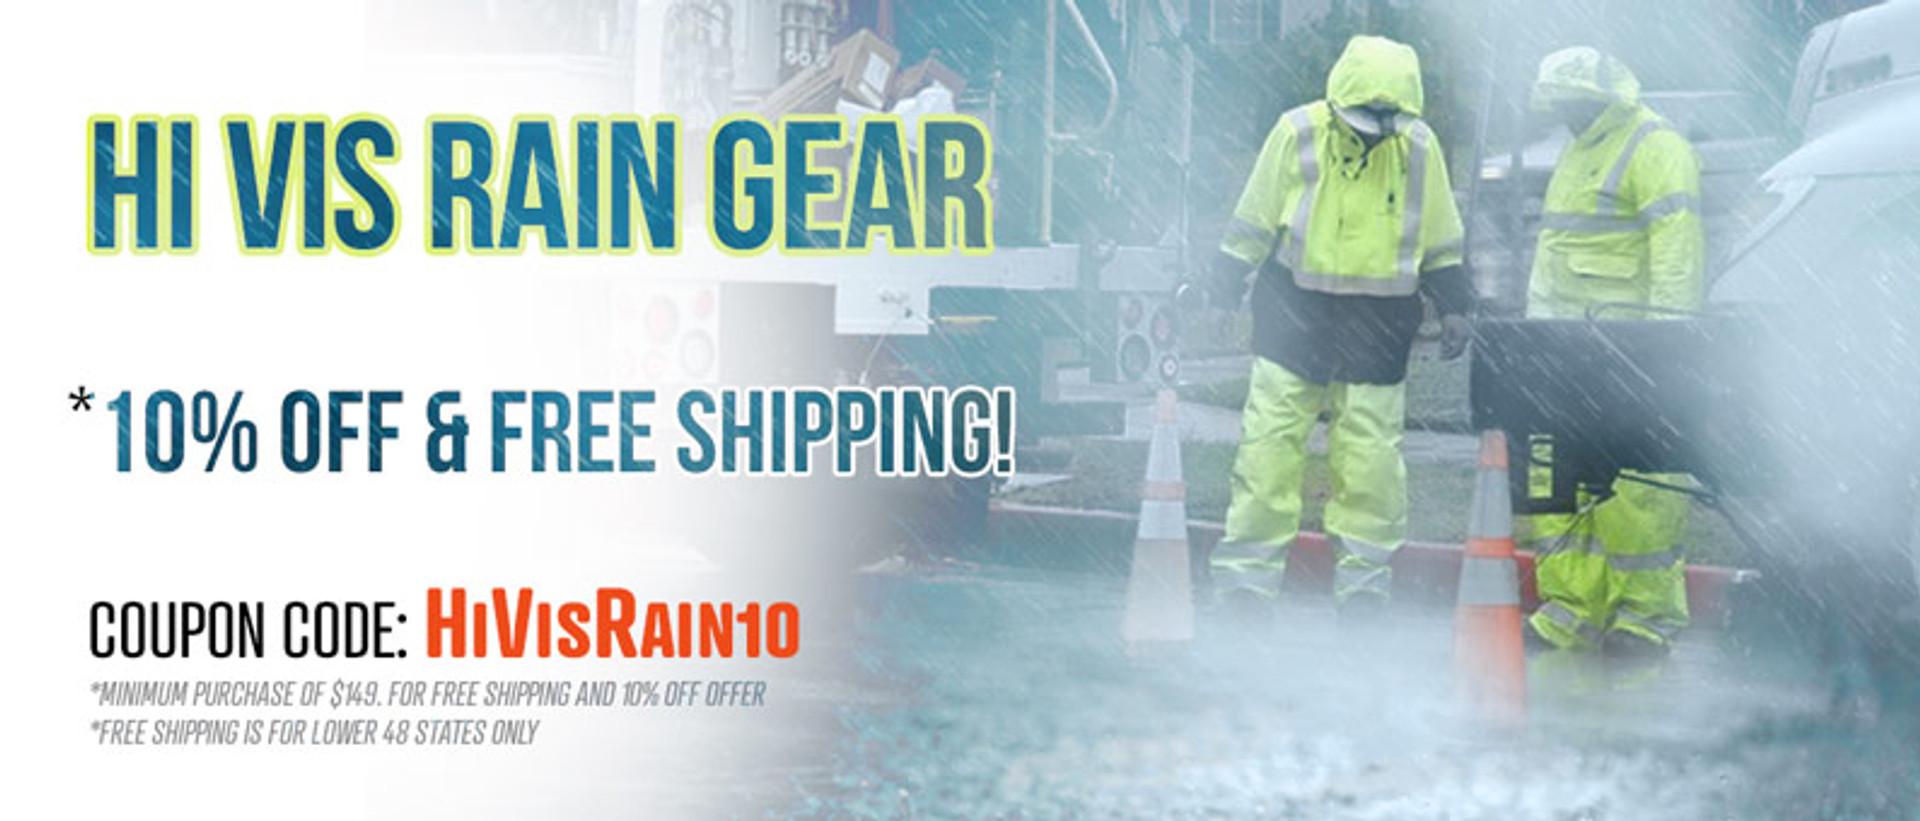 Hi Vis Rain Gear coupon